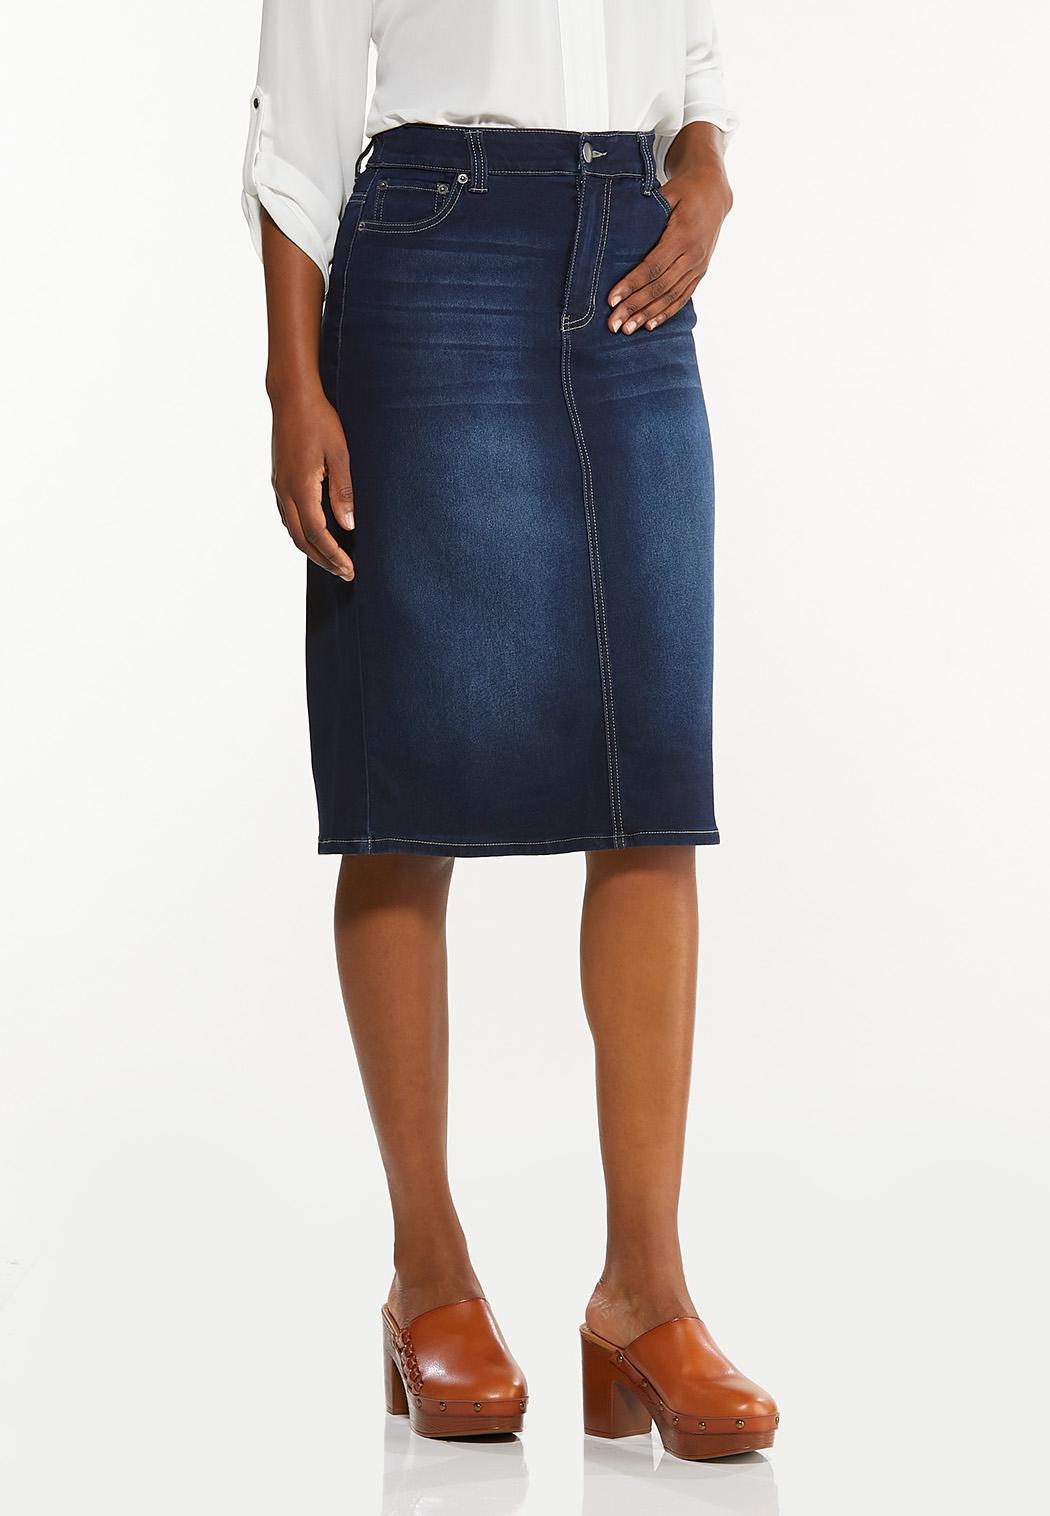 Classic Dark Wash Denim Skirt